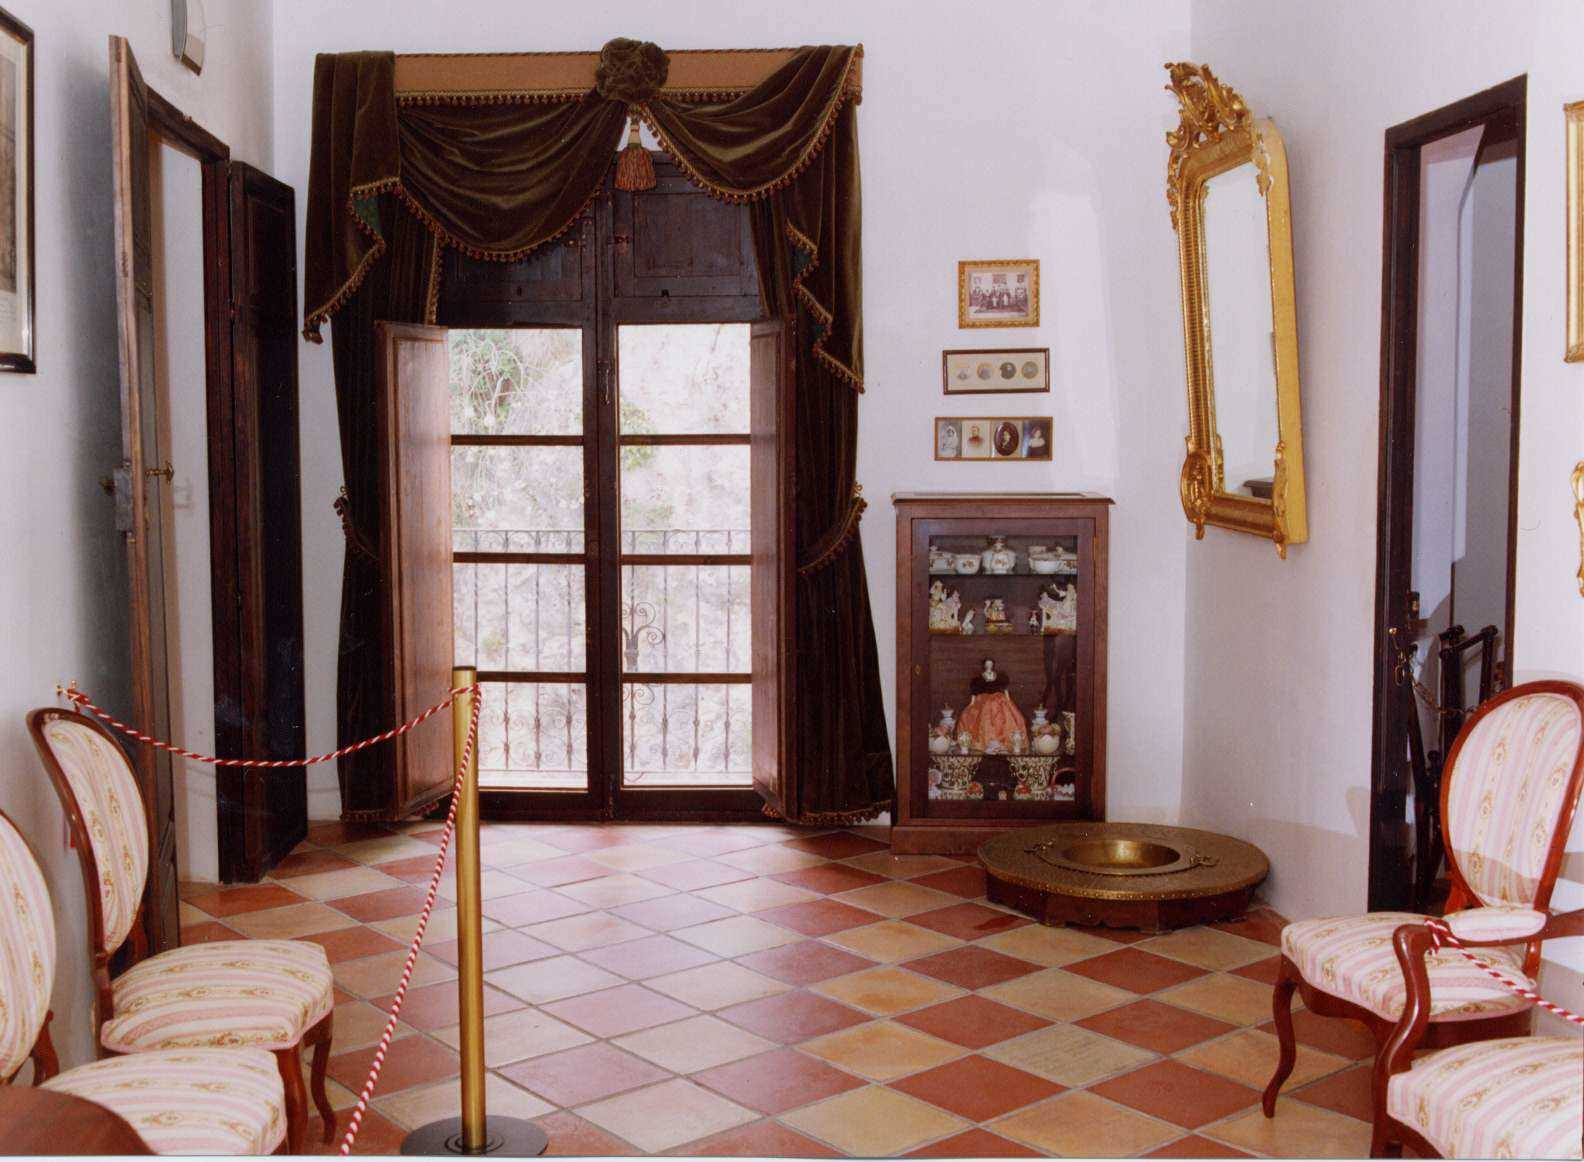 Tha Casa Orduña municipal museum